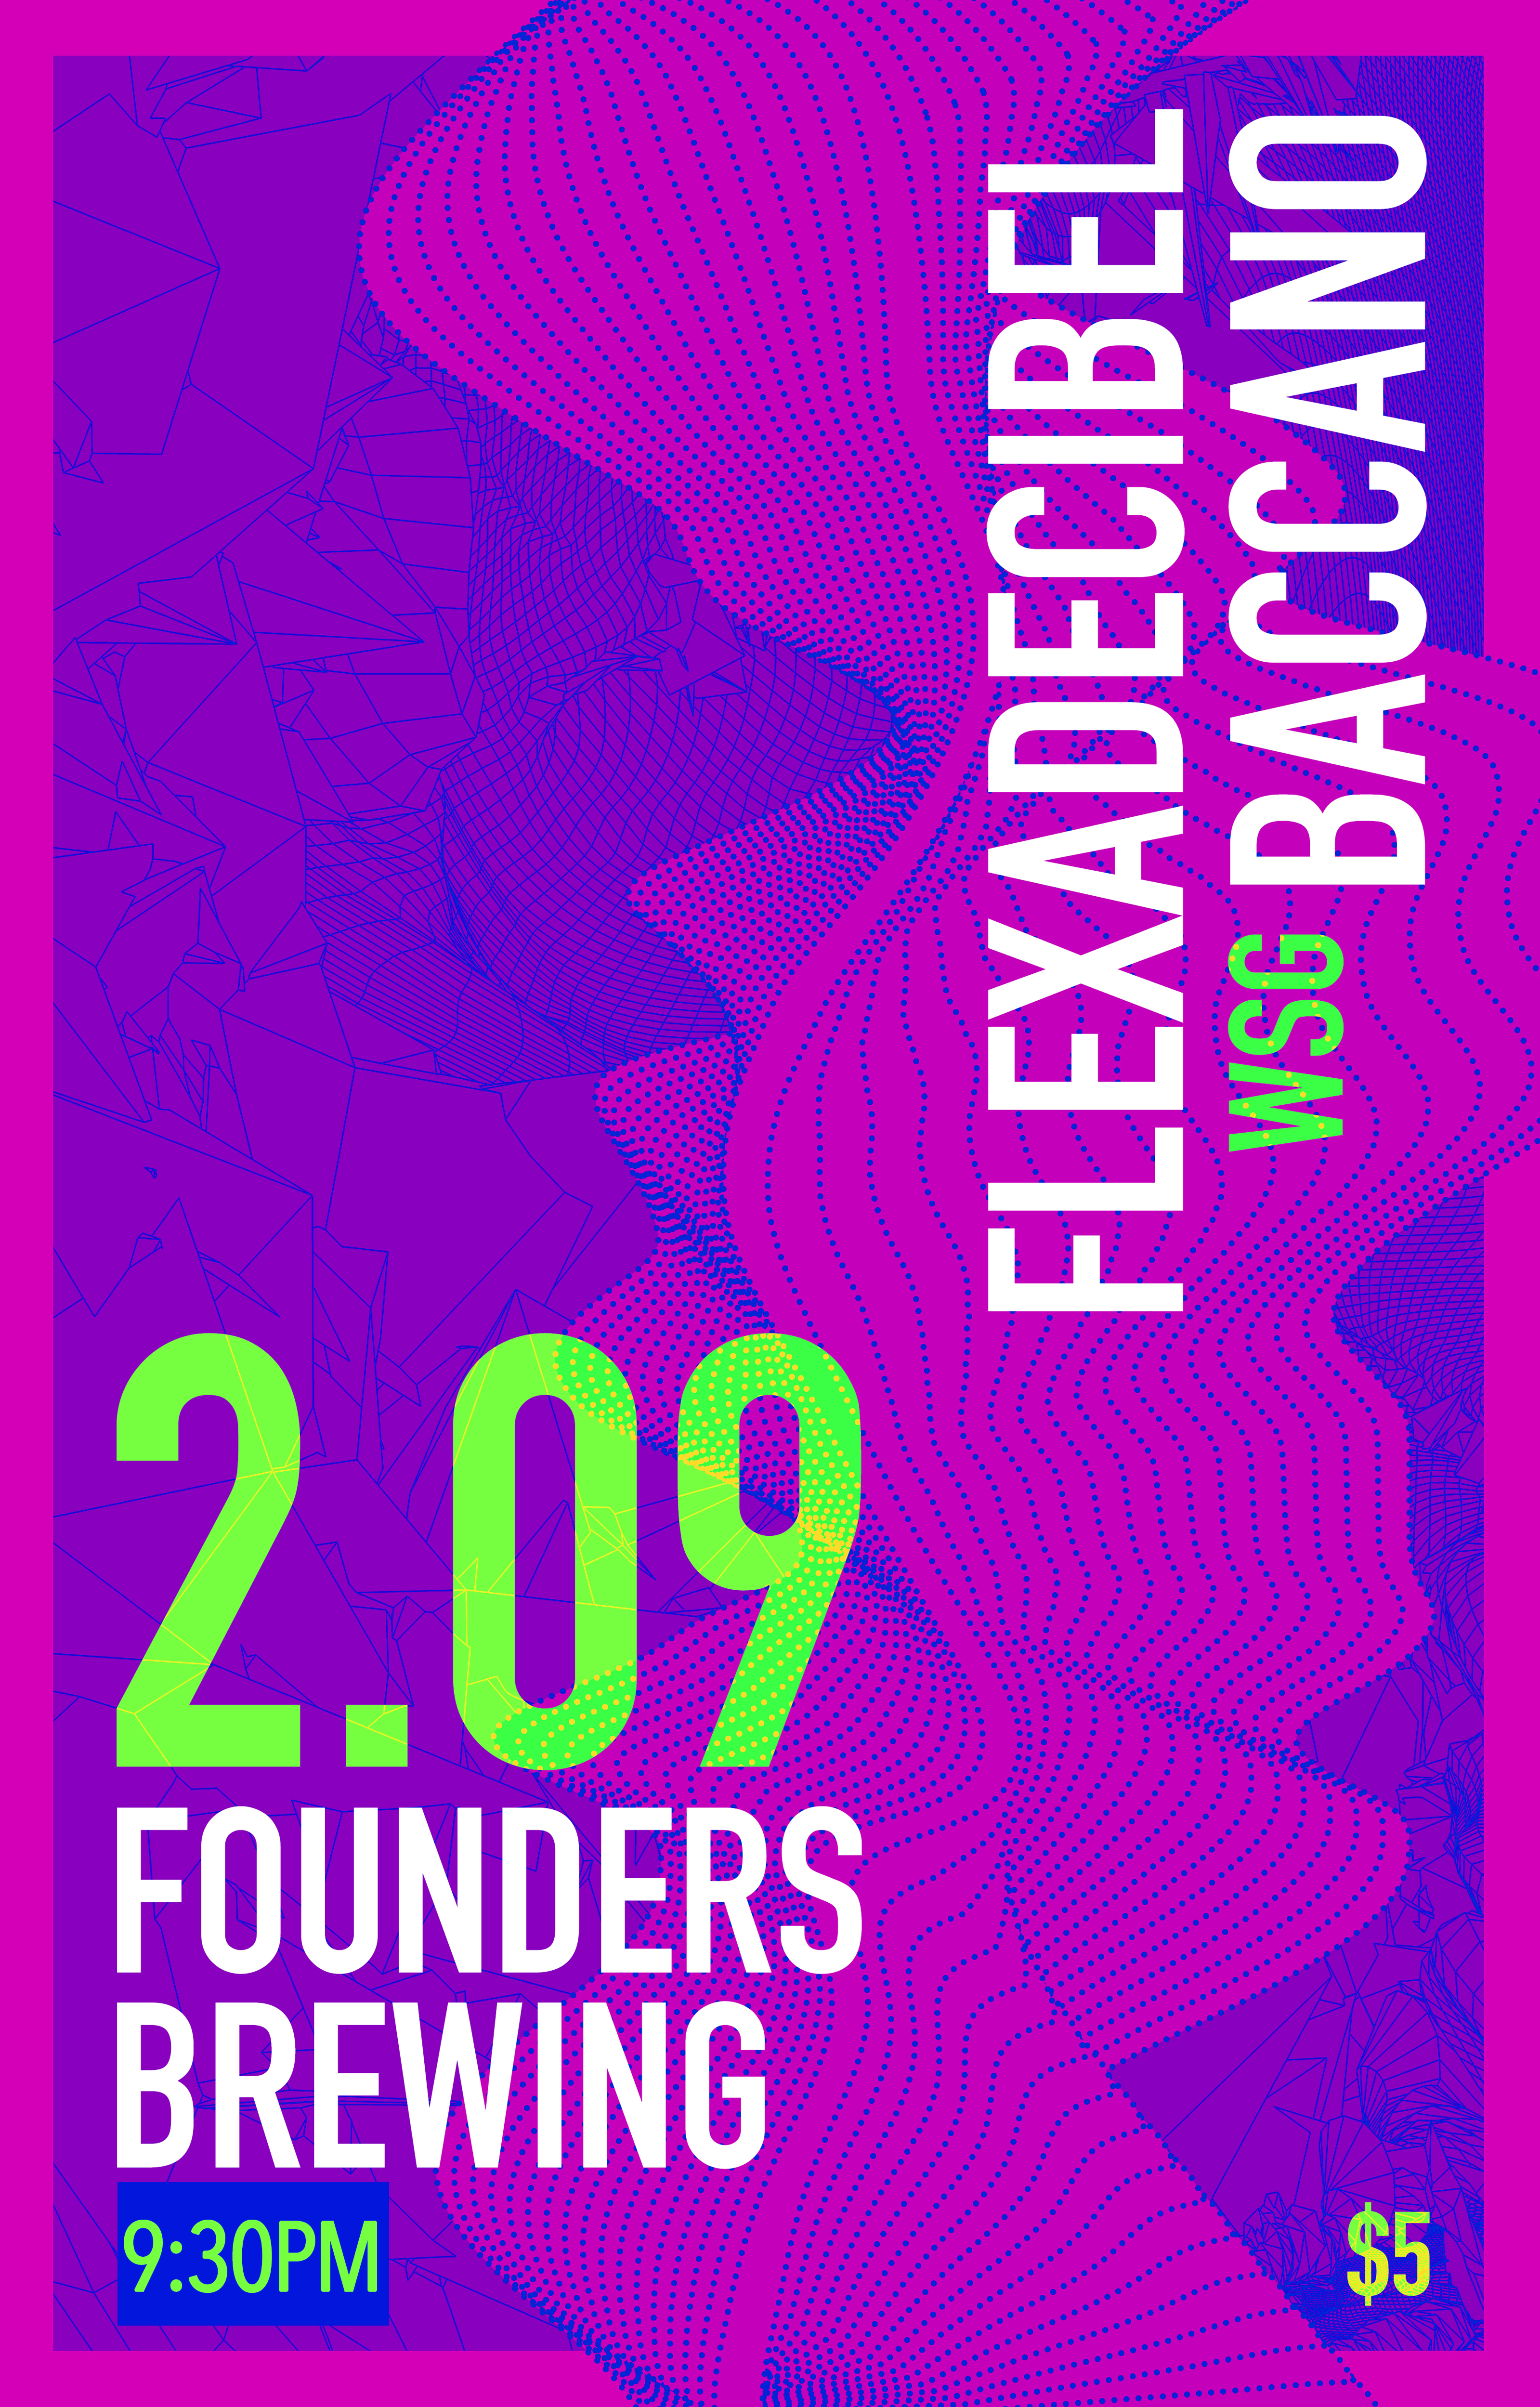 Flexadecible Baccano event poster